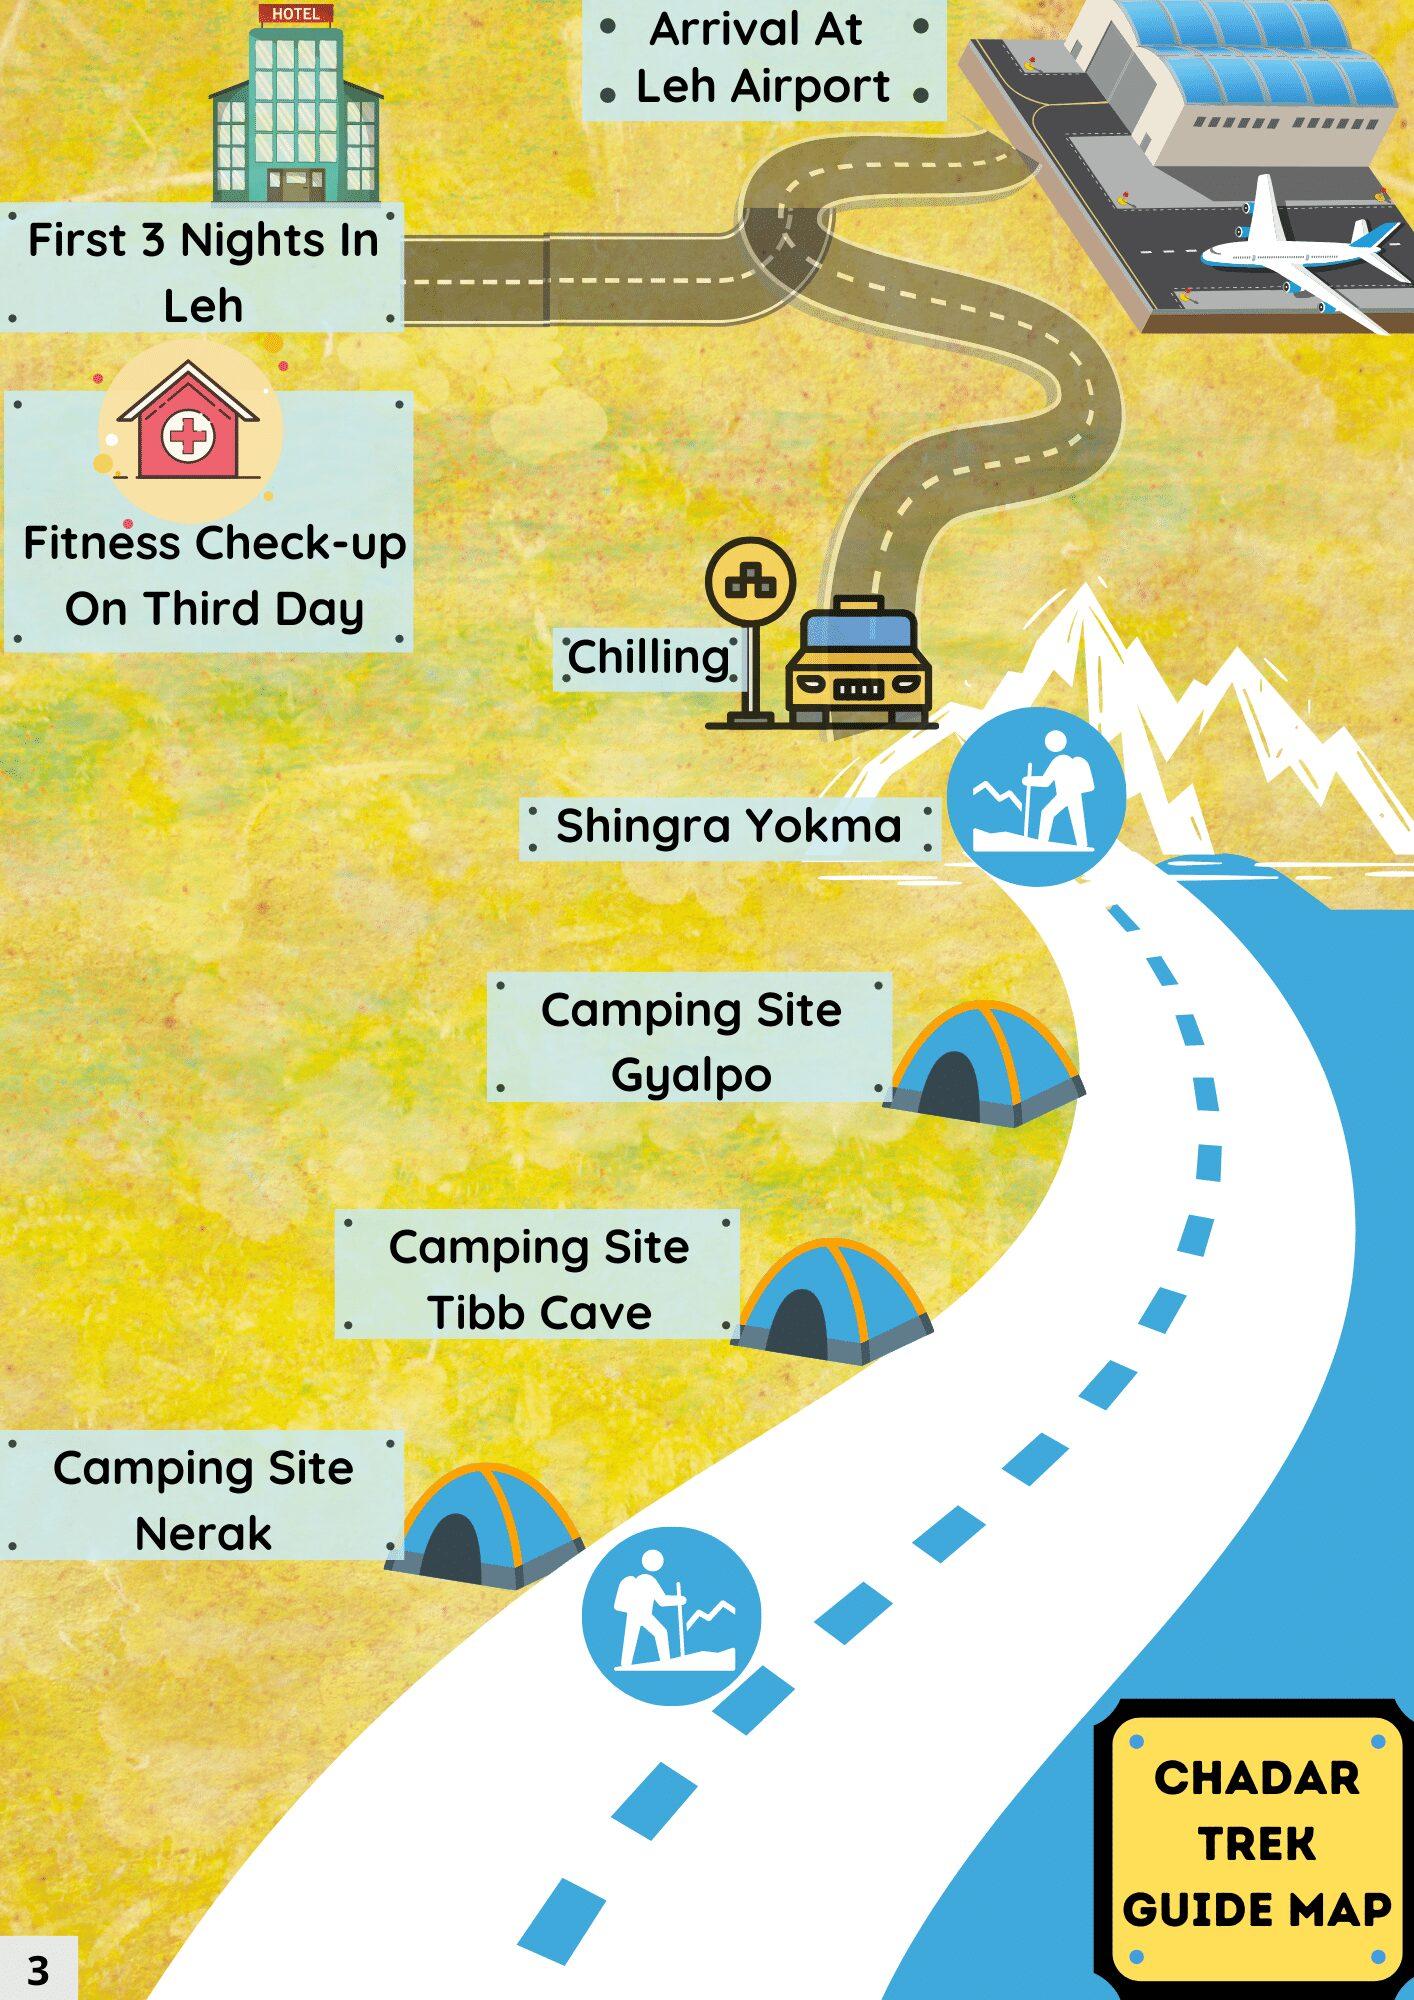 Chadar trek map